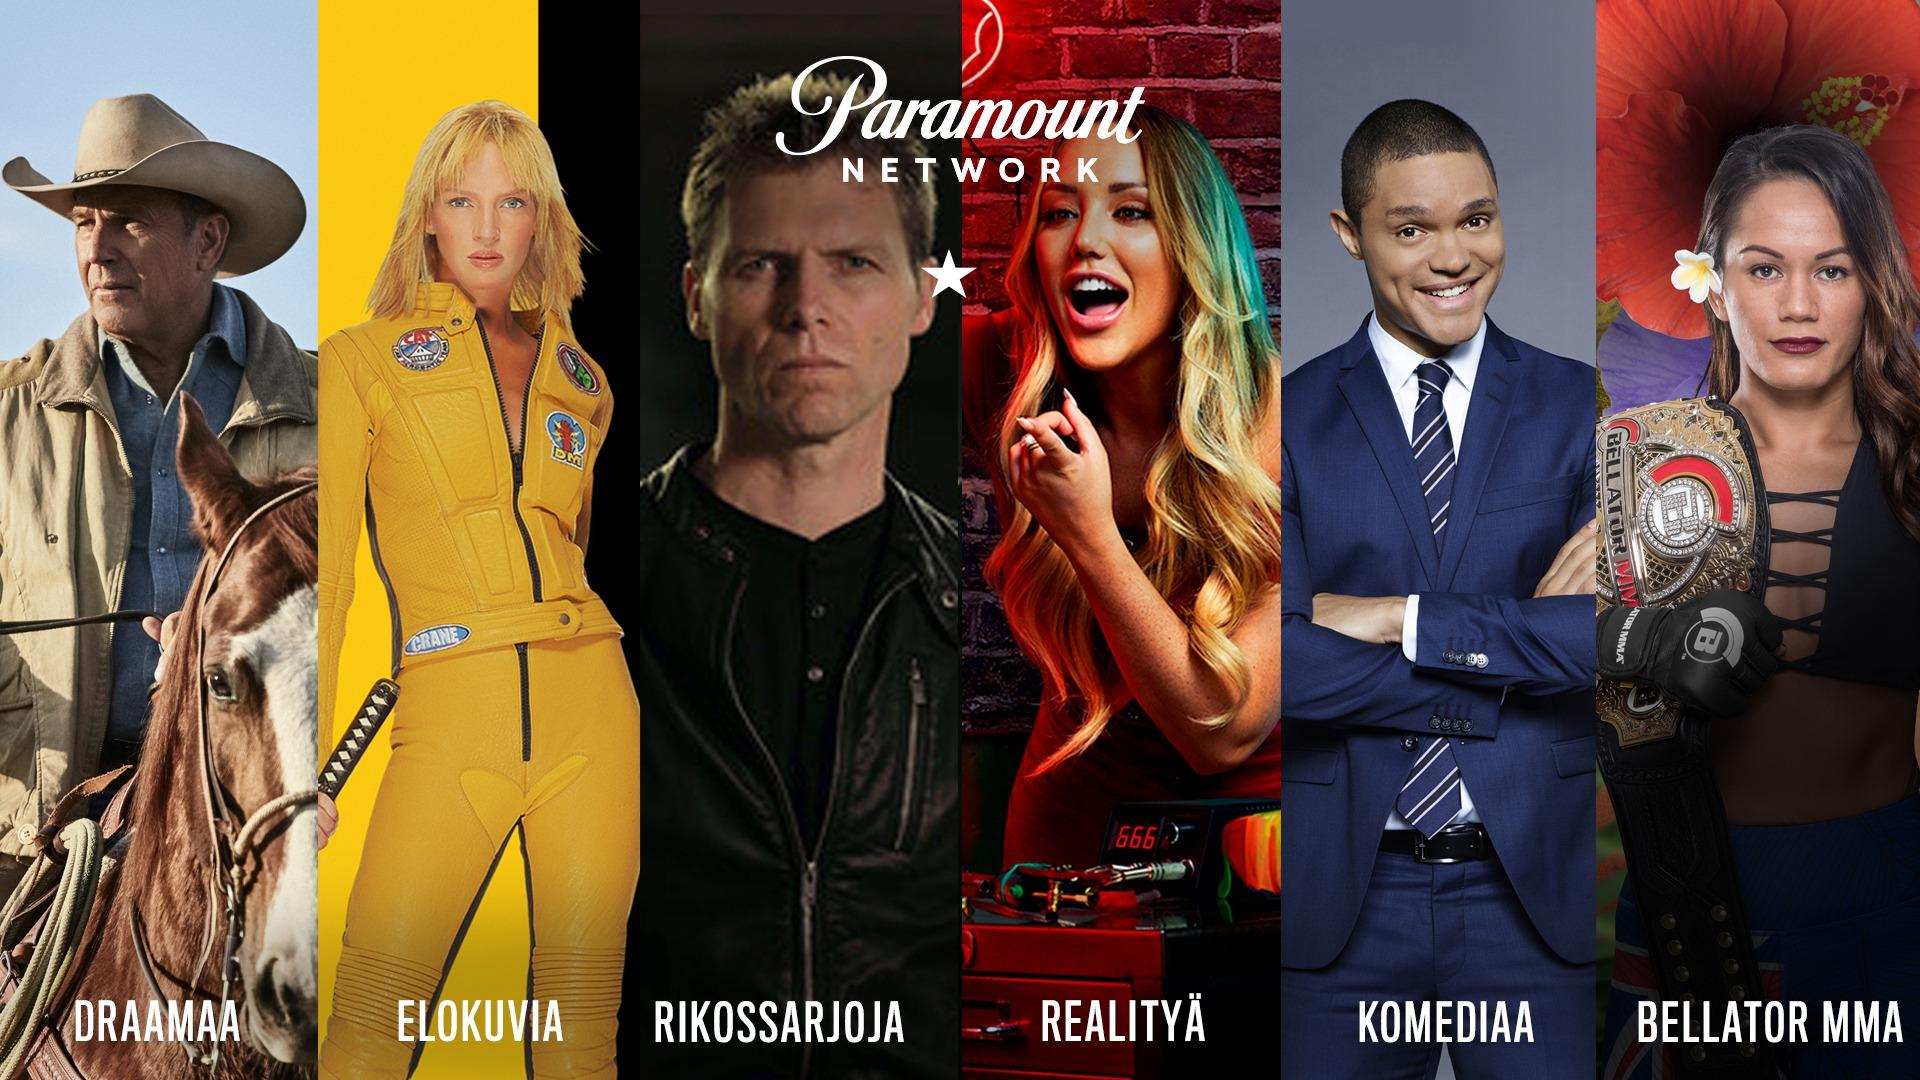 Paramount Network Kanava